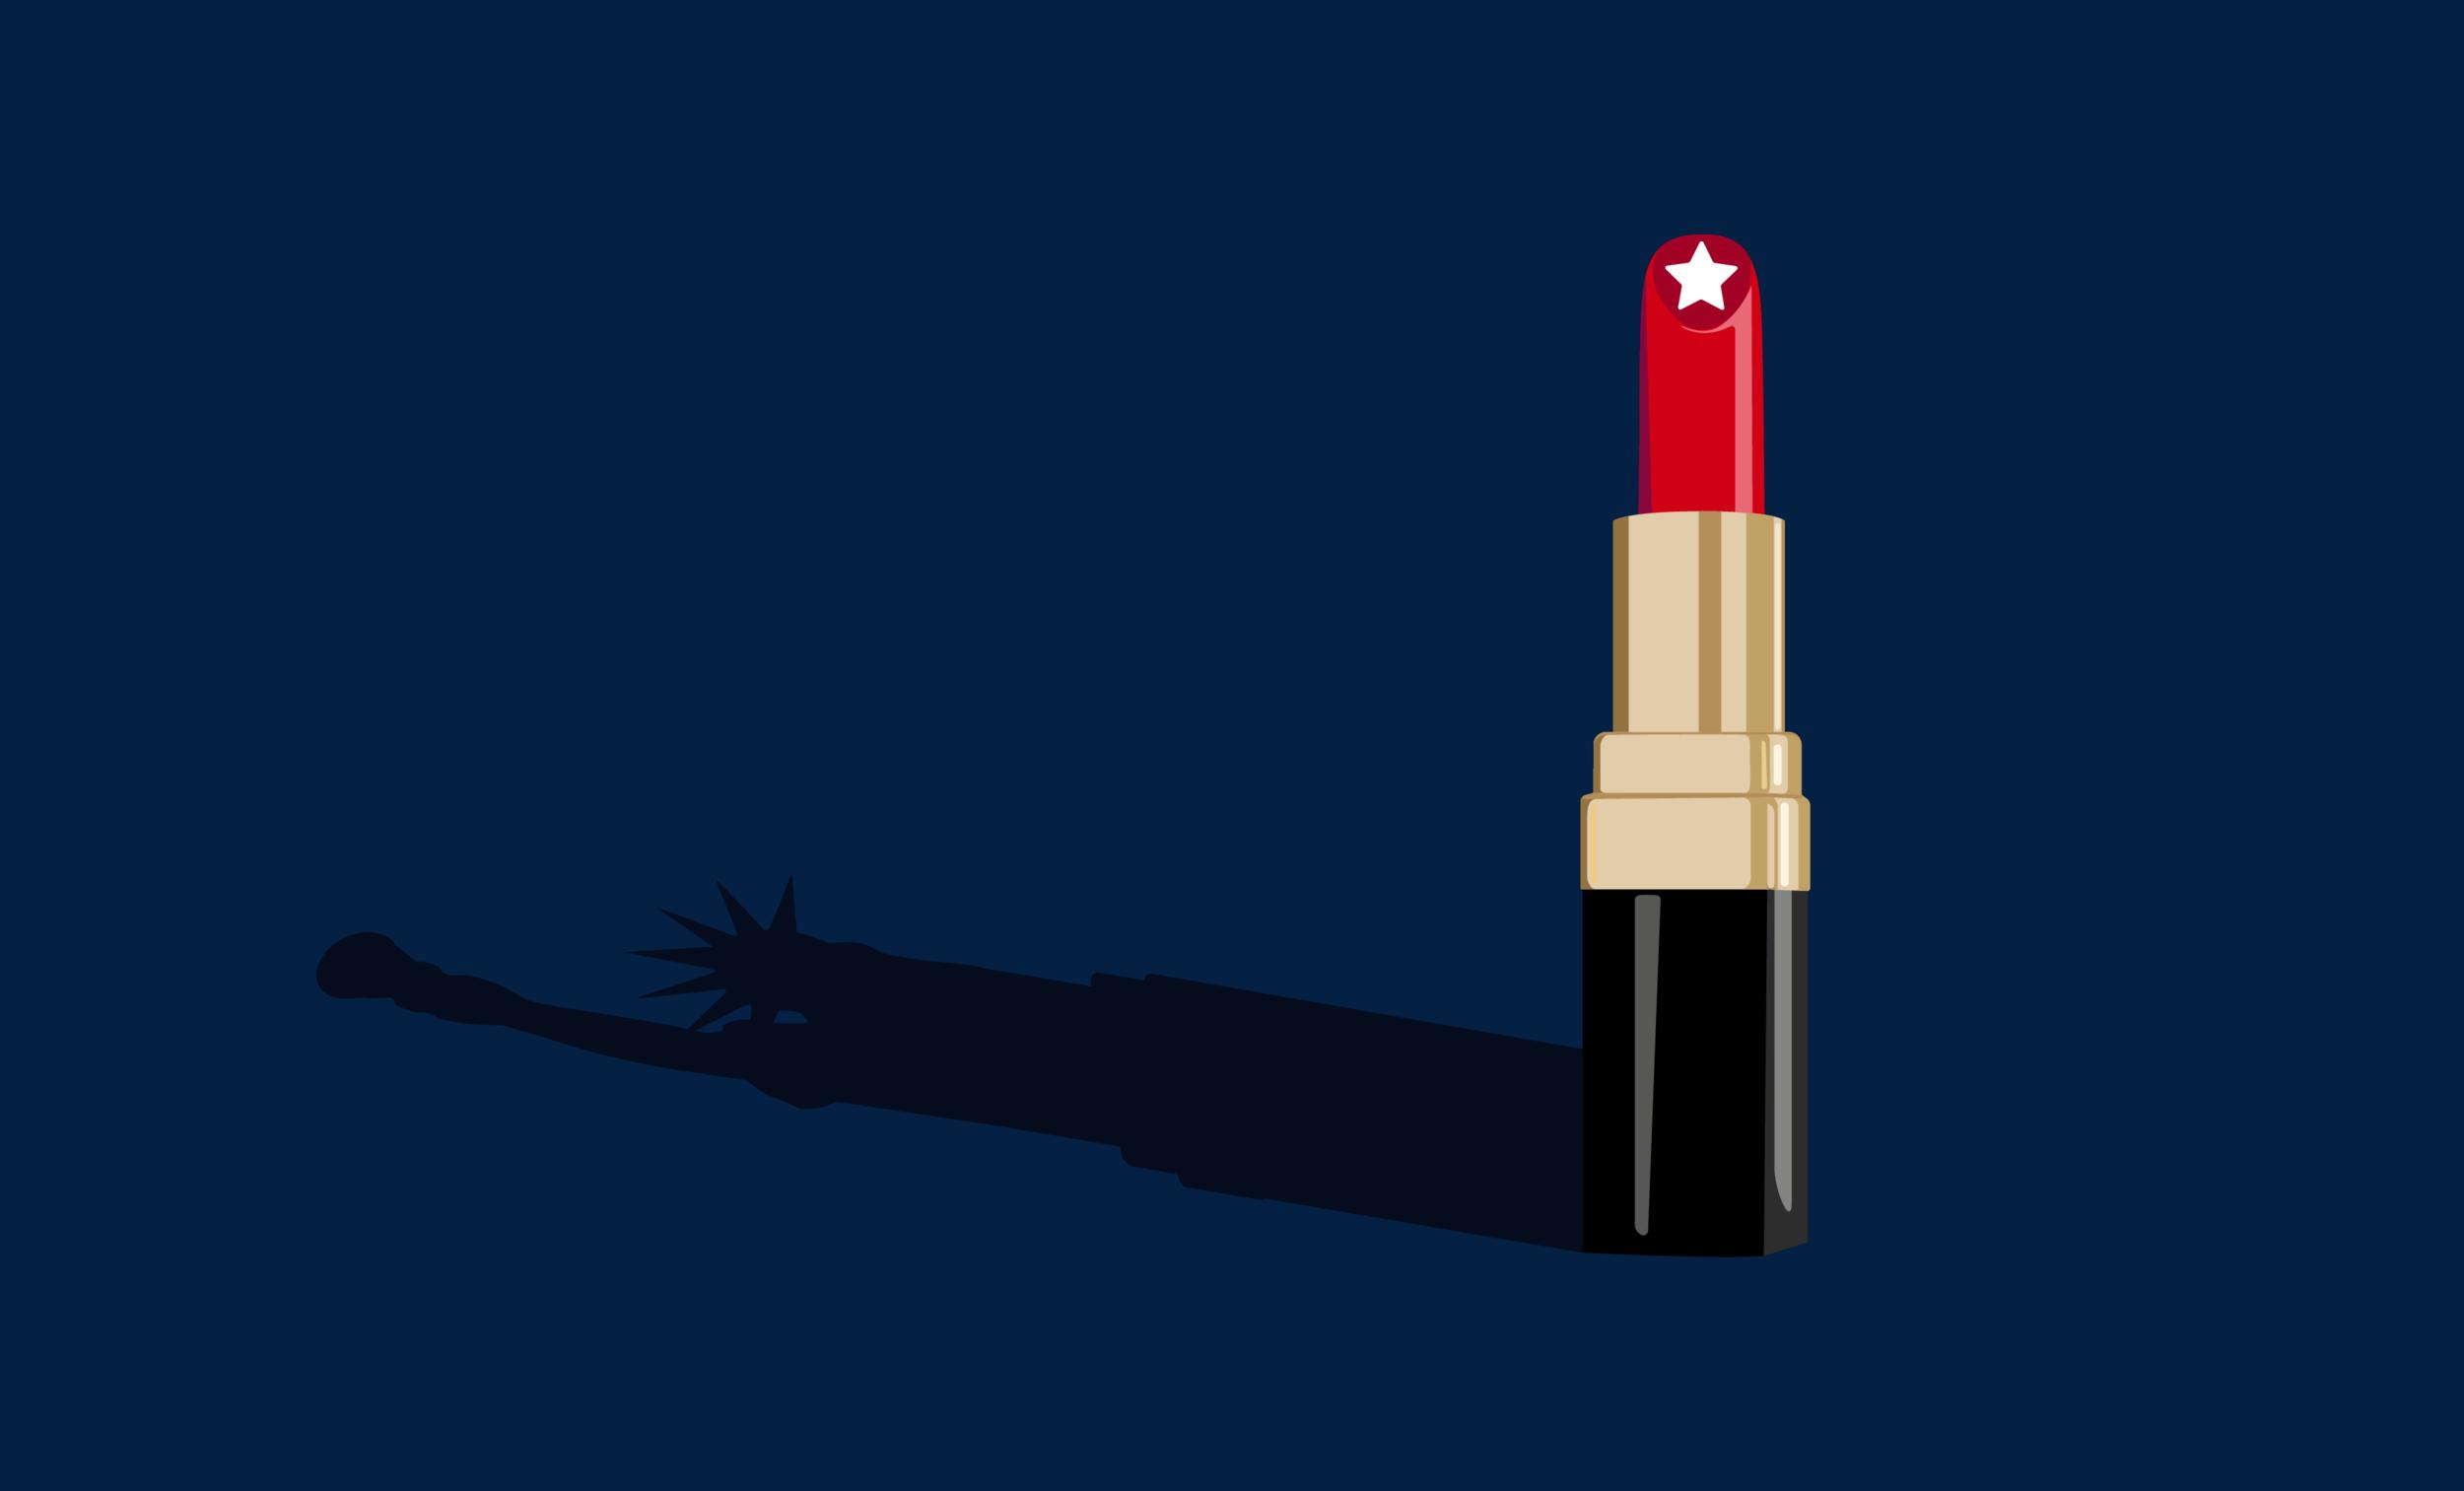 AR_lipstick_Tavola disegno 1.png